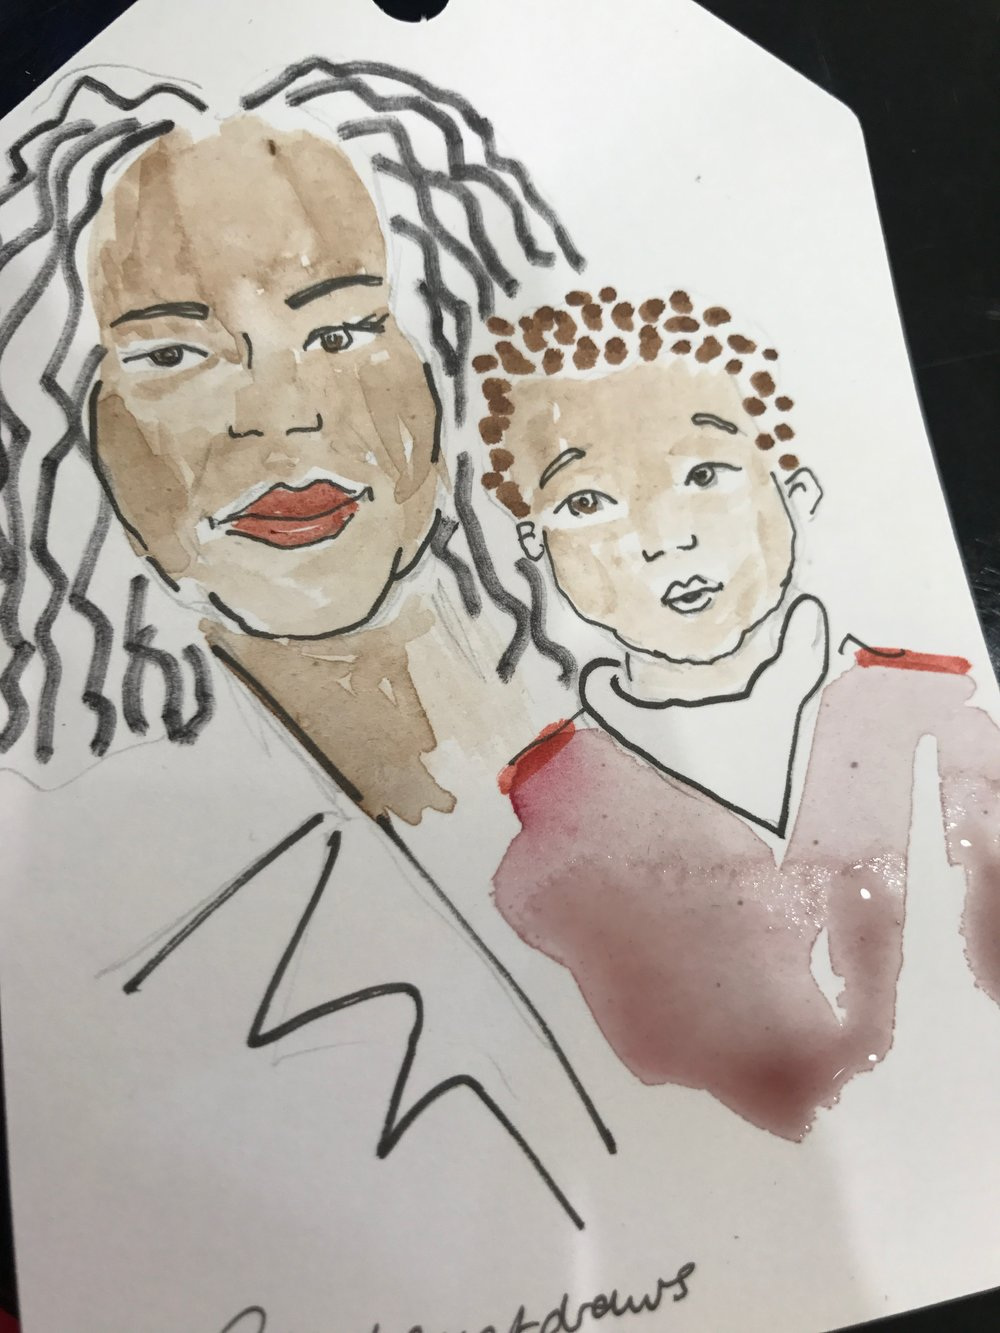 Bespoke Grandmother and Baby Illustration, Sarah Smart at Selfridges